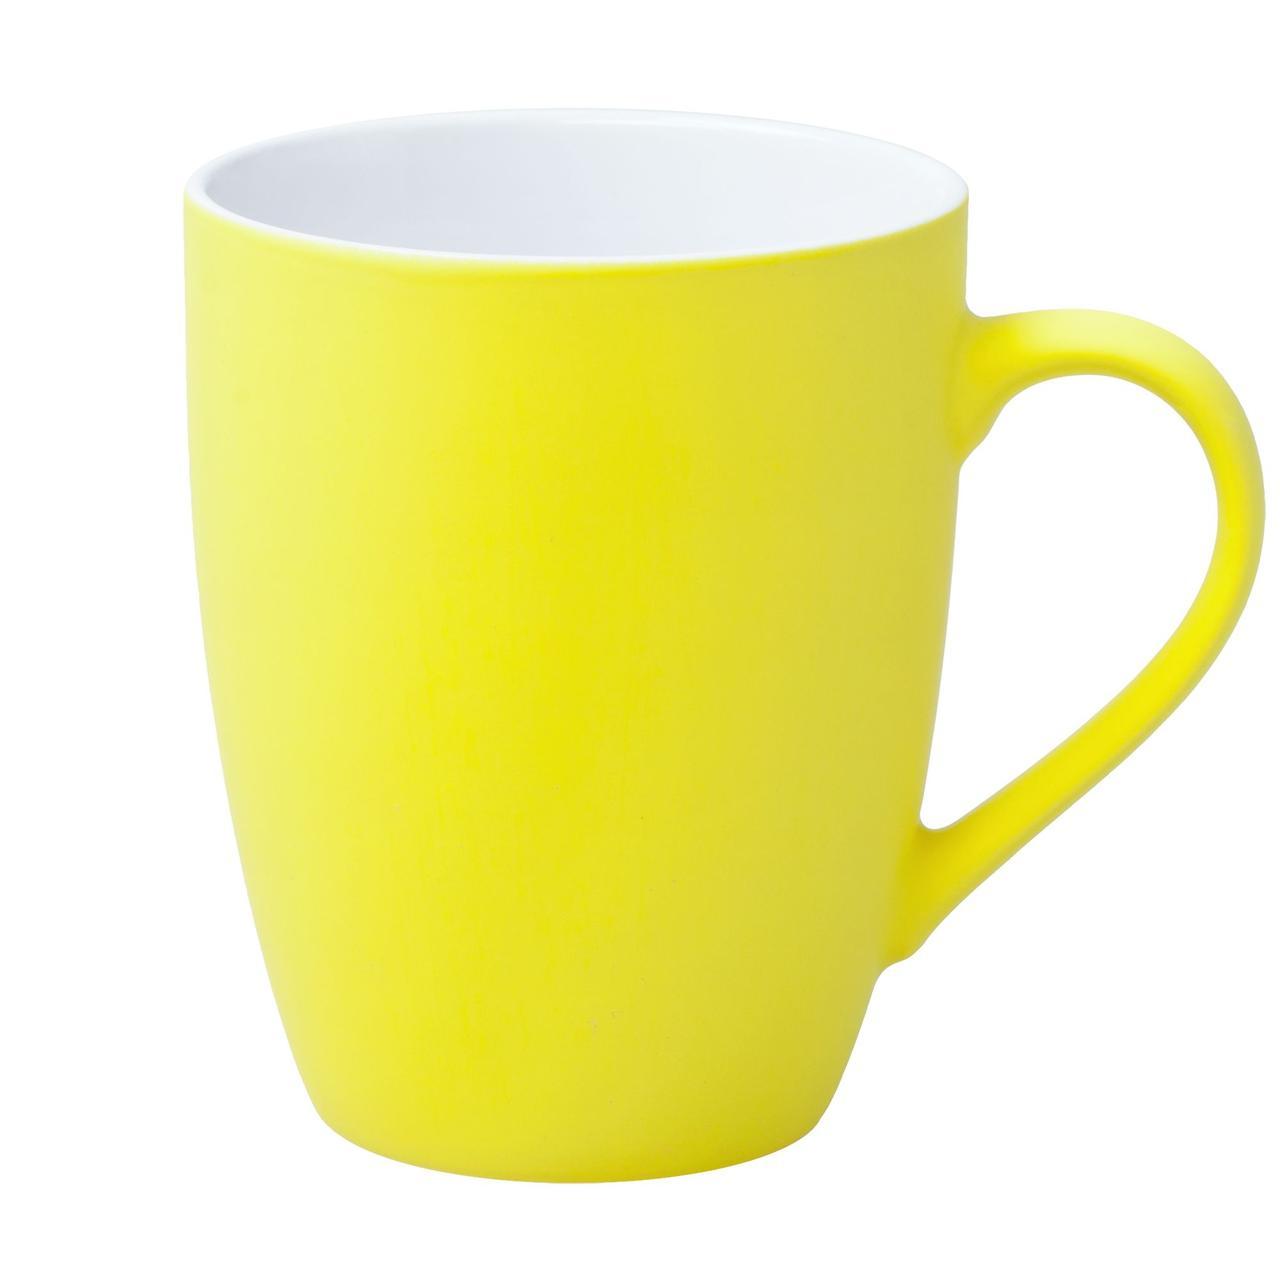 Кружка Good Morning c покрытием софт-тач, желтая (артикул 6483.81)